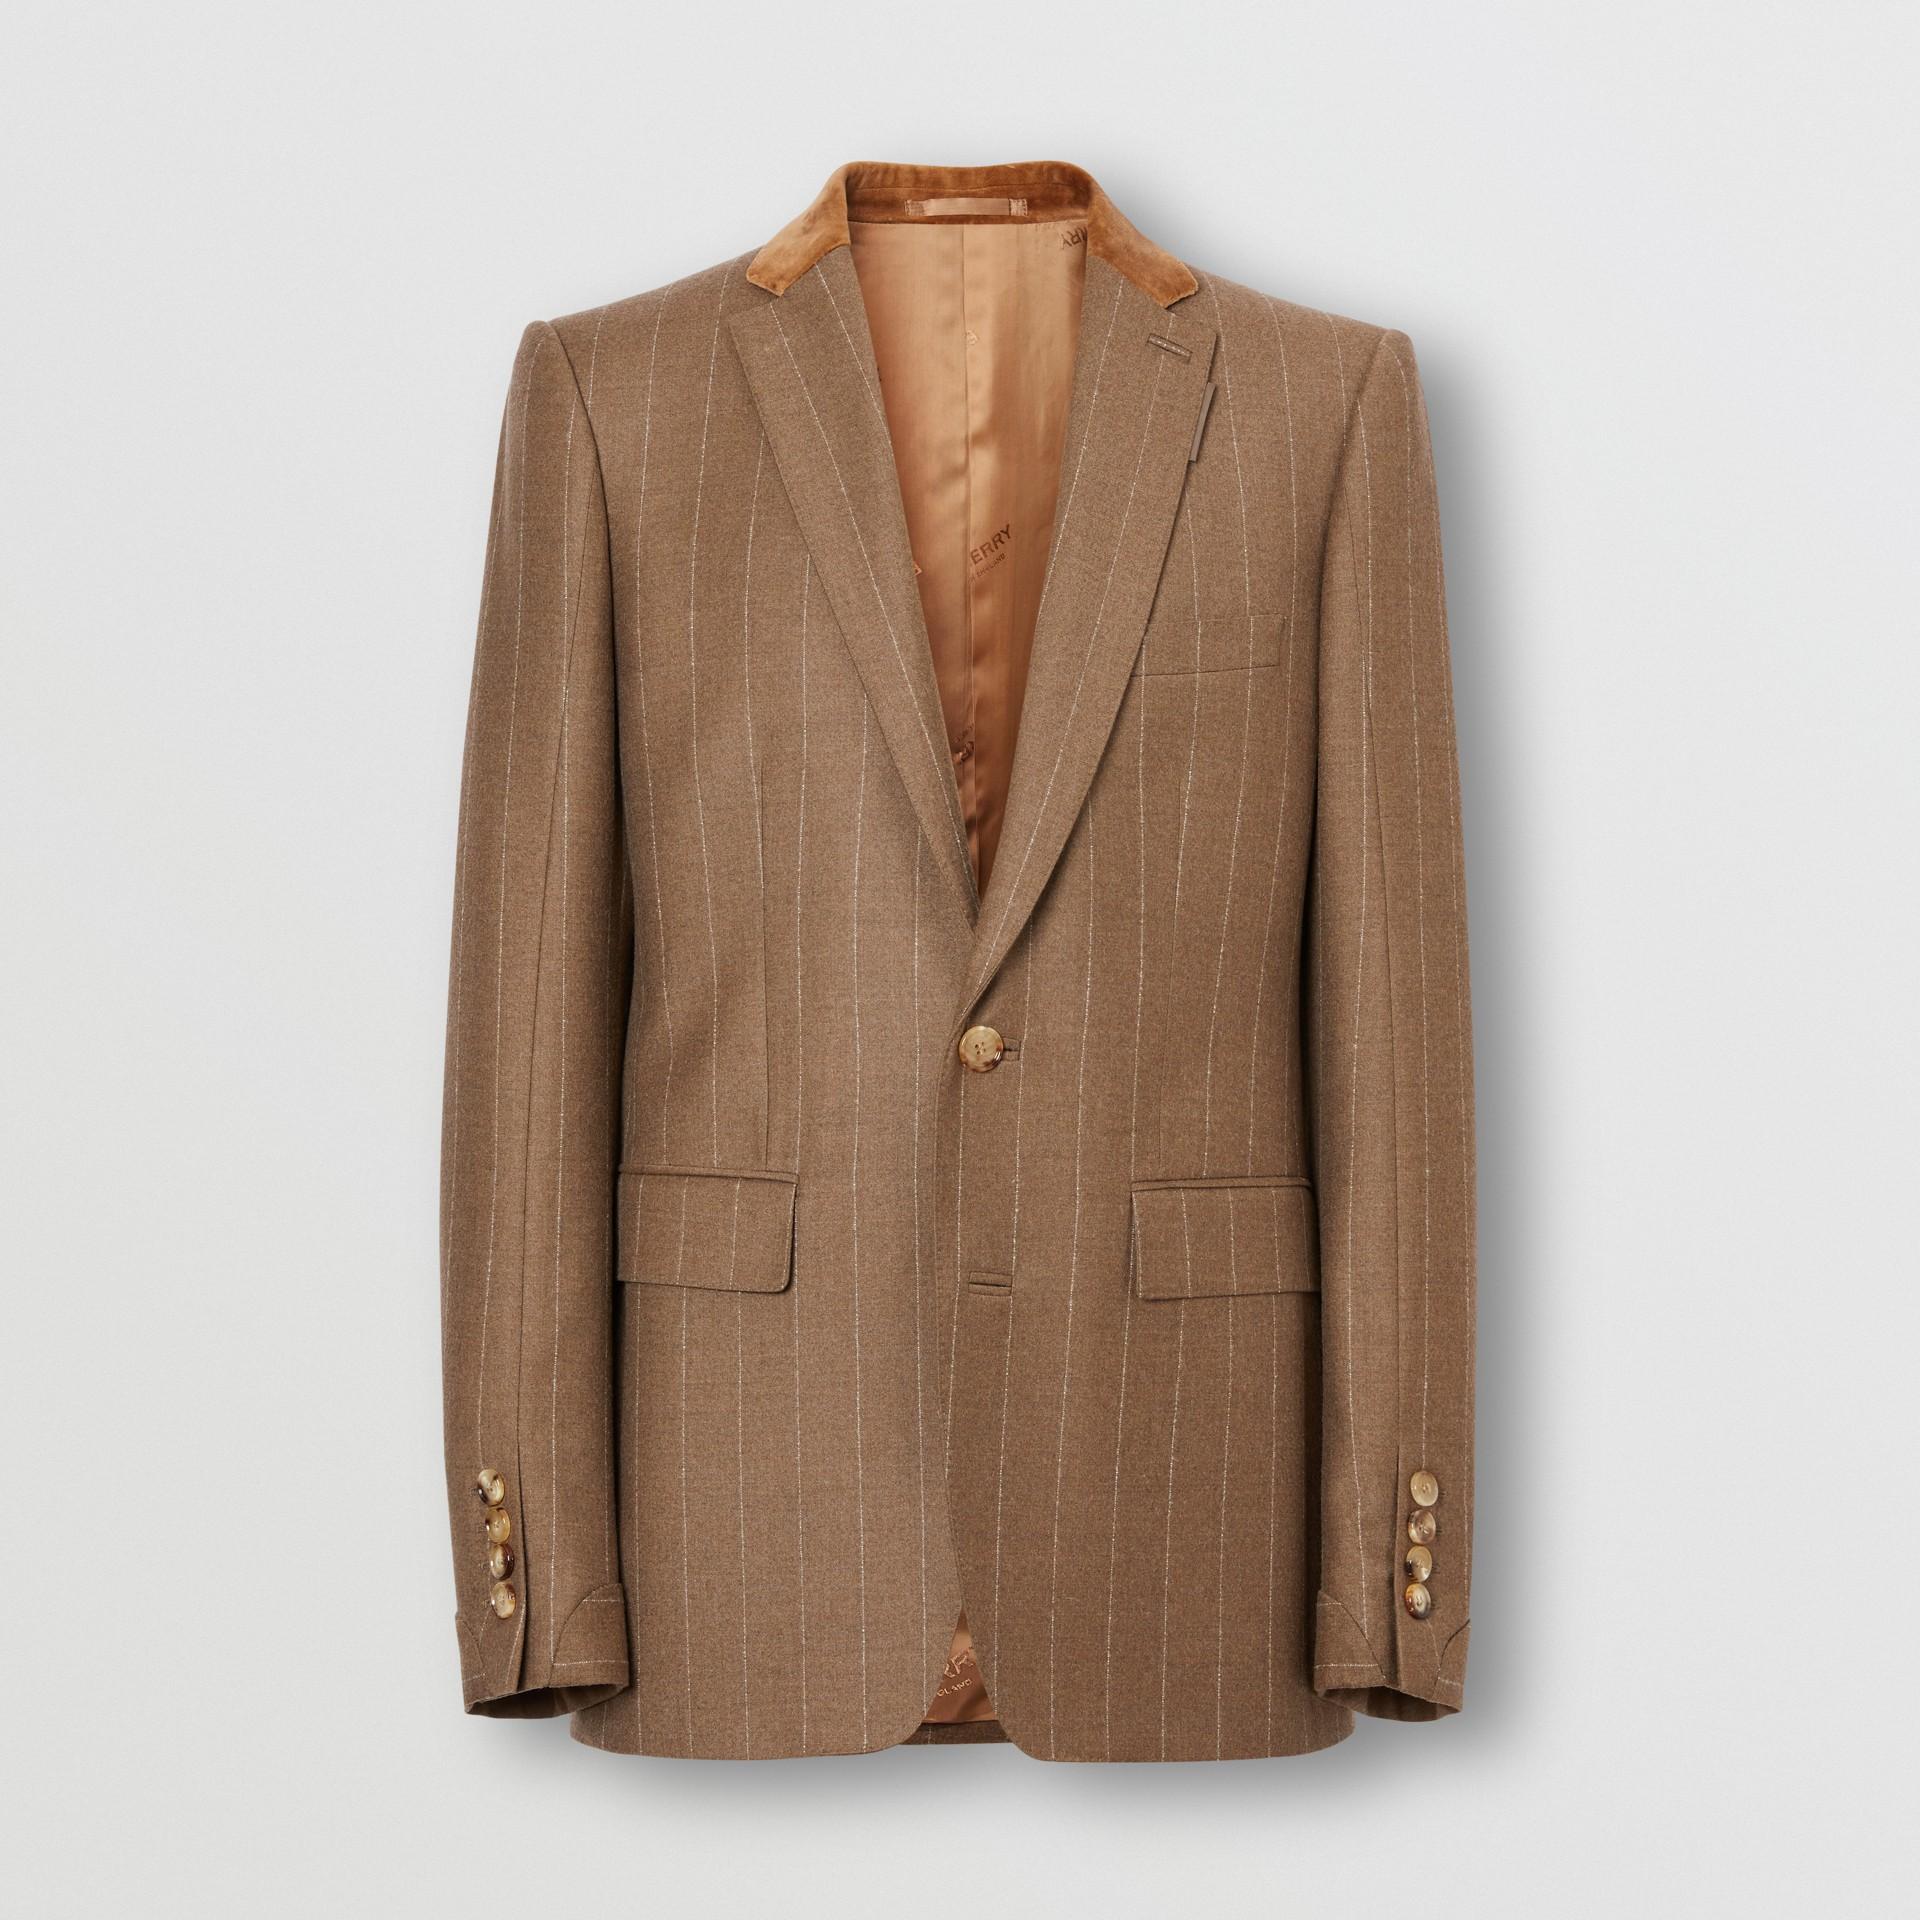 Classic Fit Velvet Trim Wool Cashmere Tailored Jacket in Dark Tan - Men | Burberry - gallery image 2